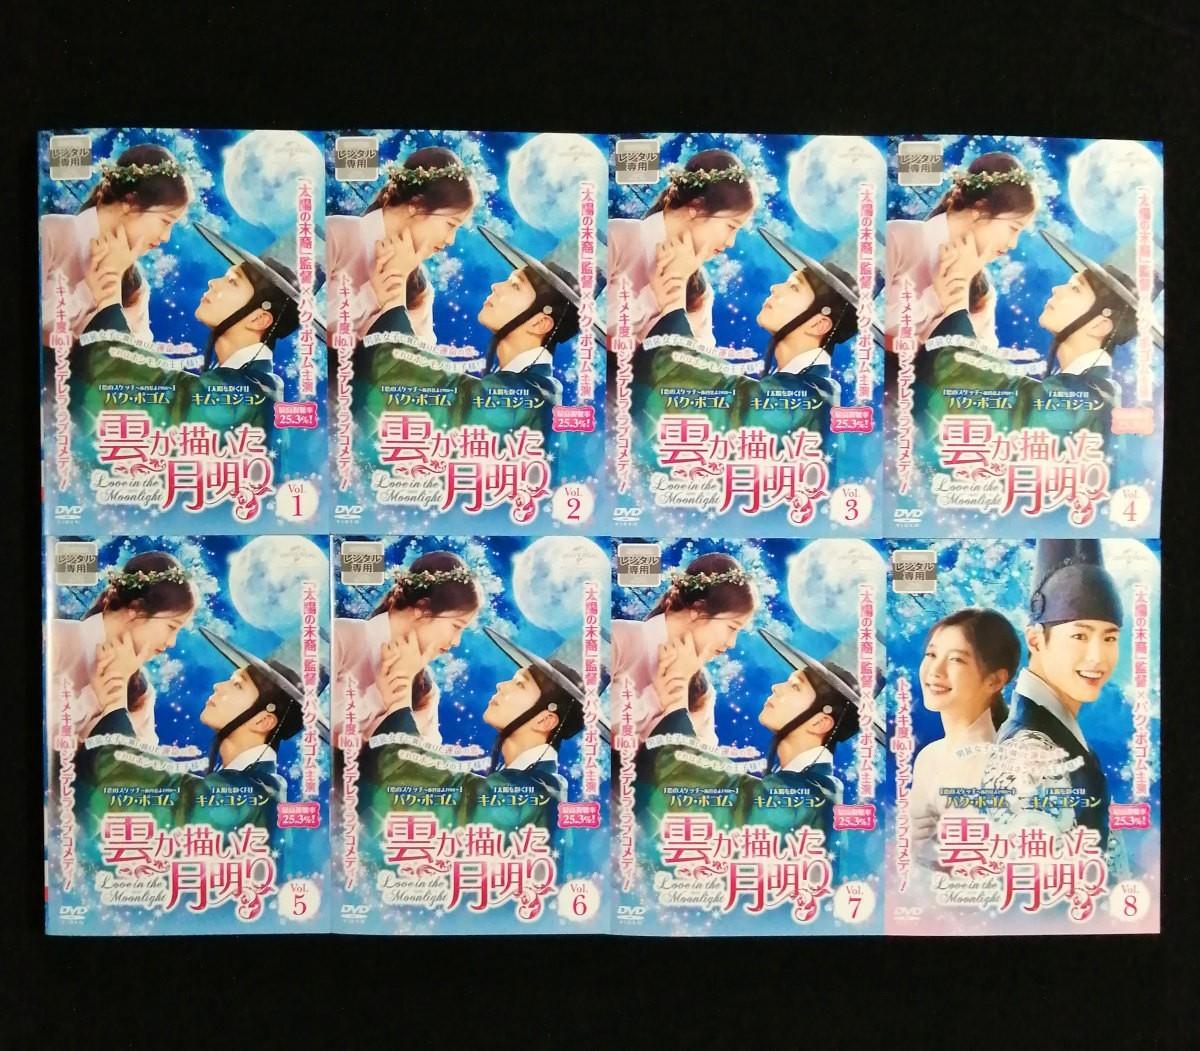 DVD 雲が描いた月明り 全14巻セット 韓国ドラマ レンタル版